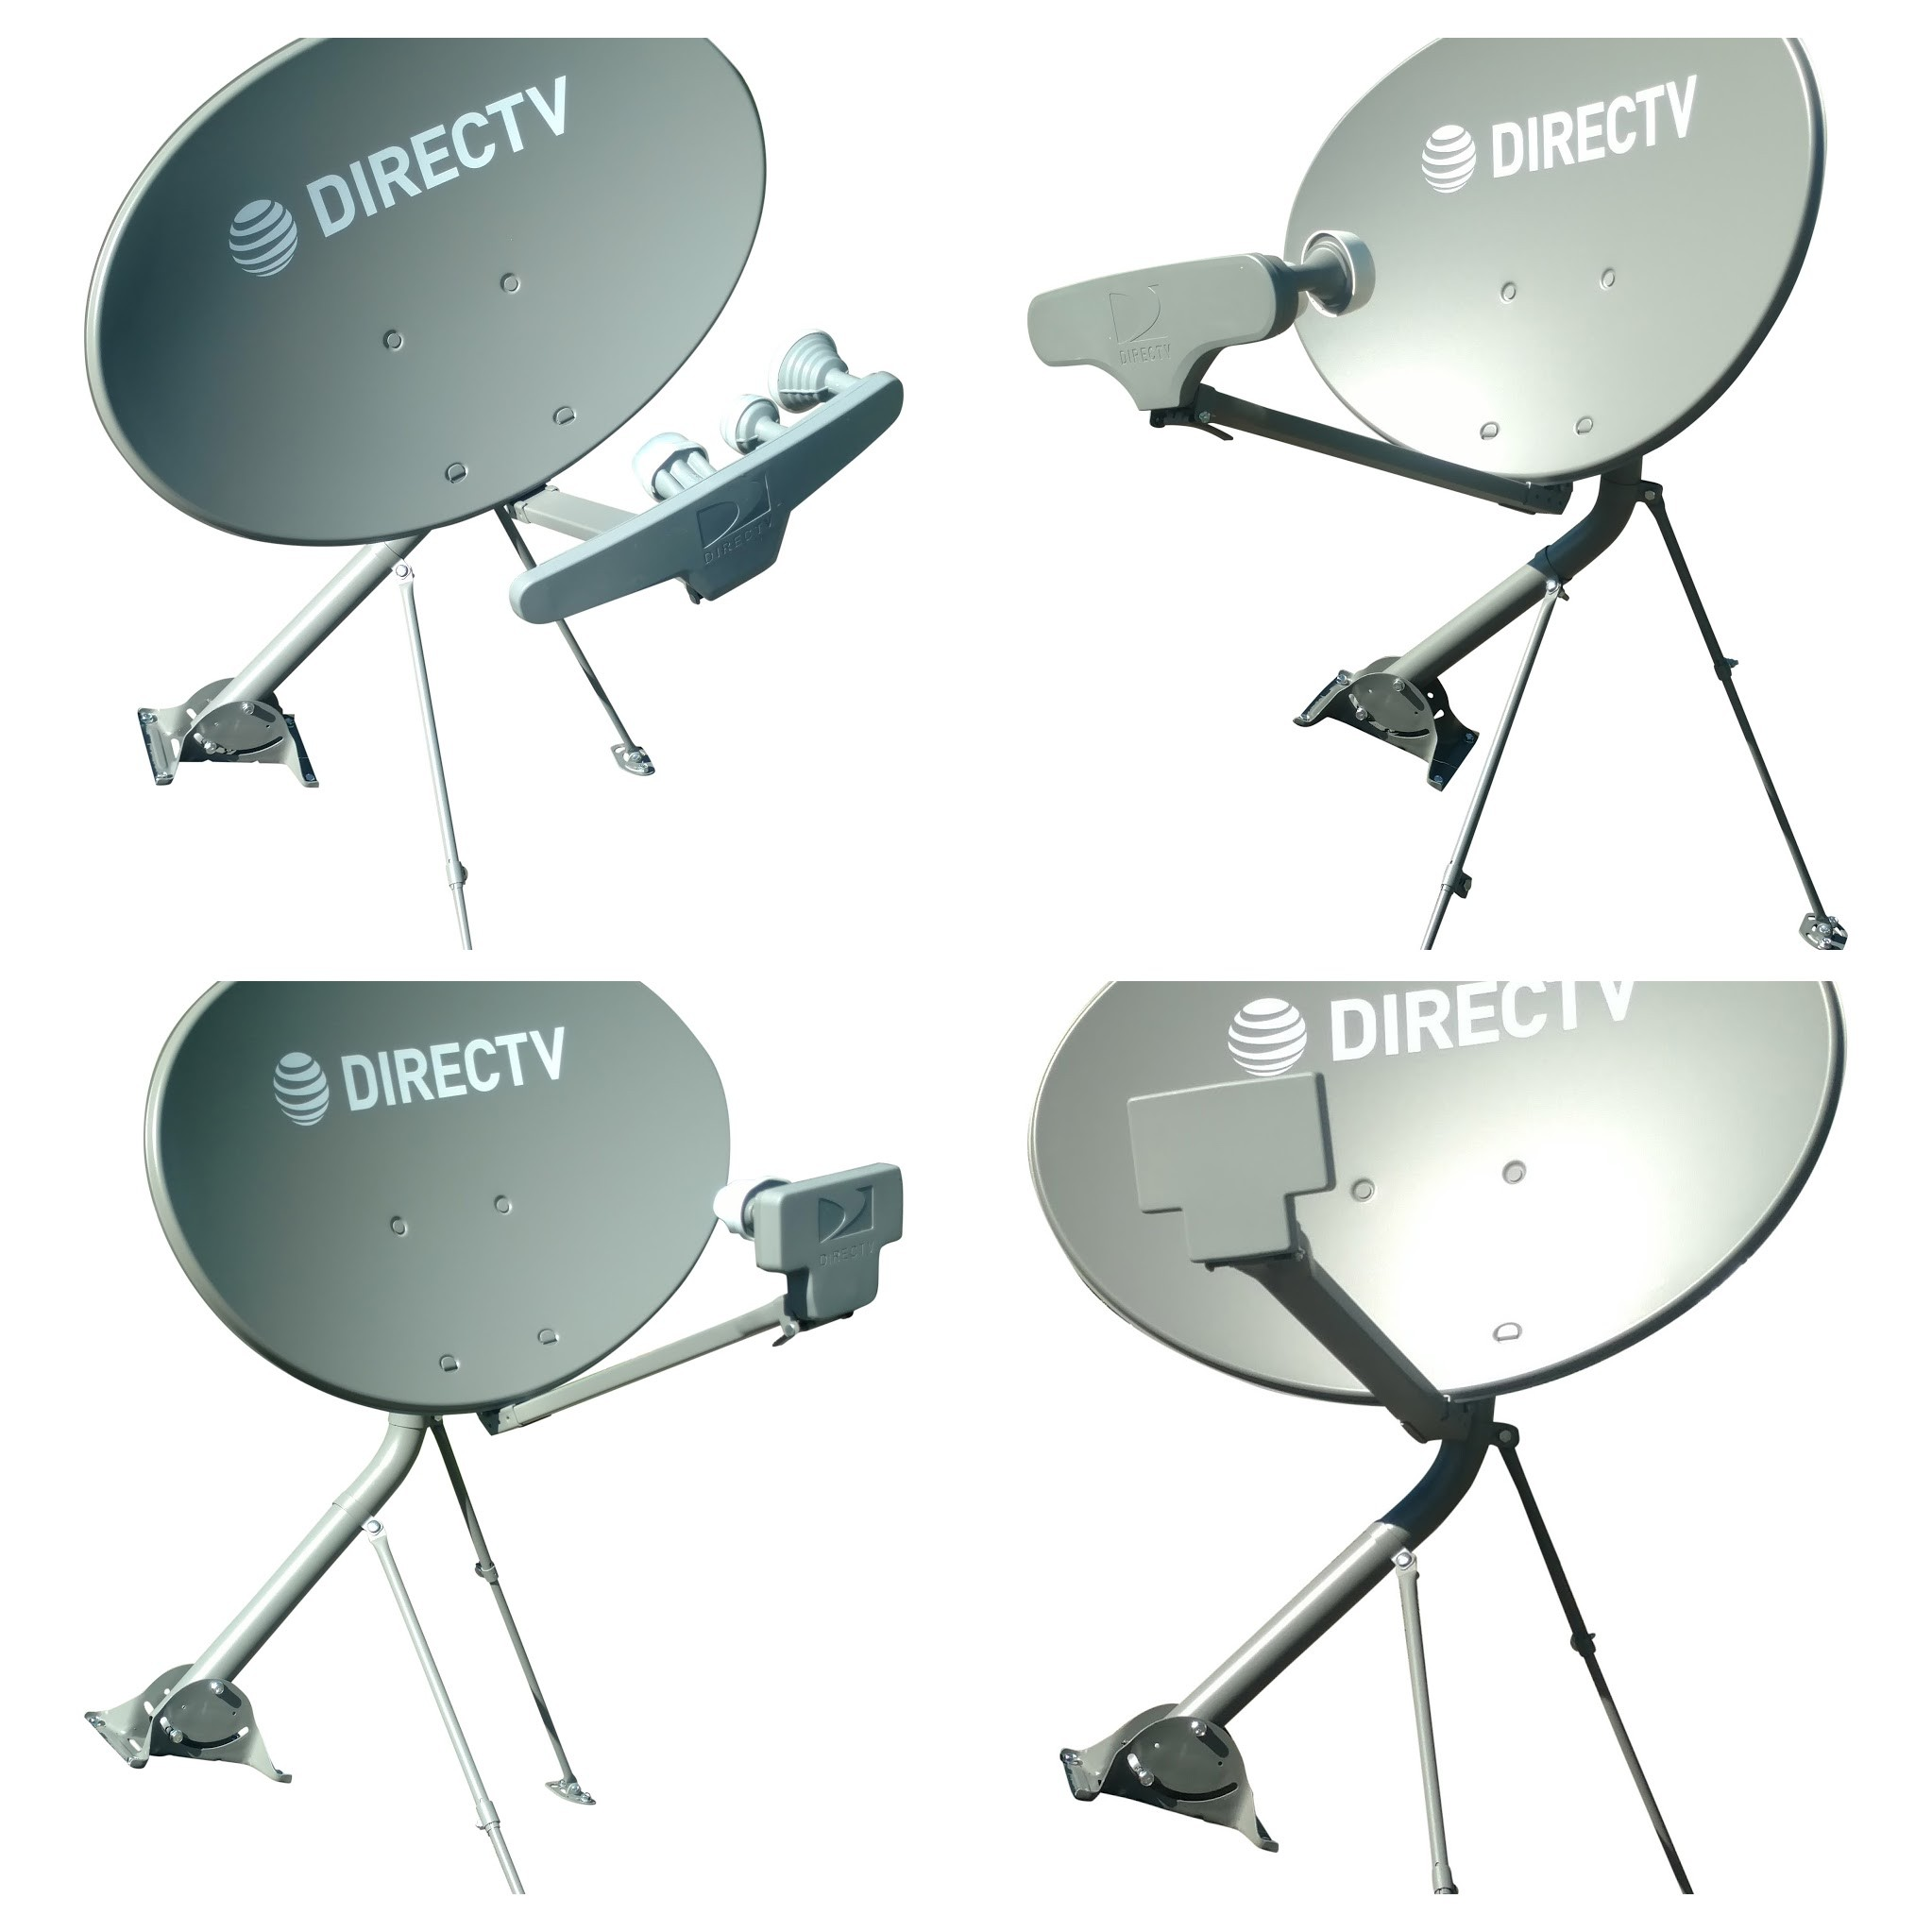 Directv Swm Splitter Wiring Diagram Directv Hd Slimline and Dual Lnb Satellite Dish Antennas Of Directv Swm Splitter Wiring Diagram